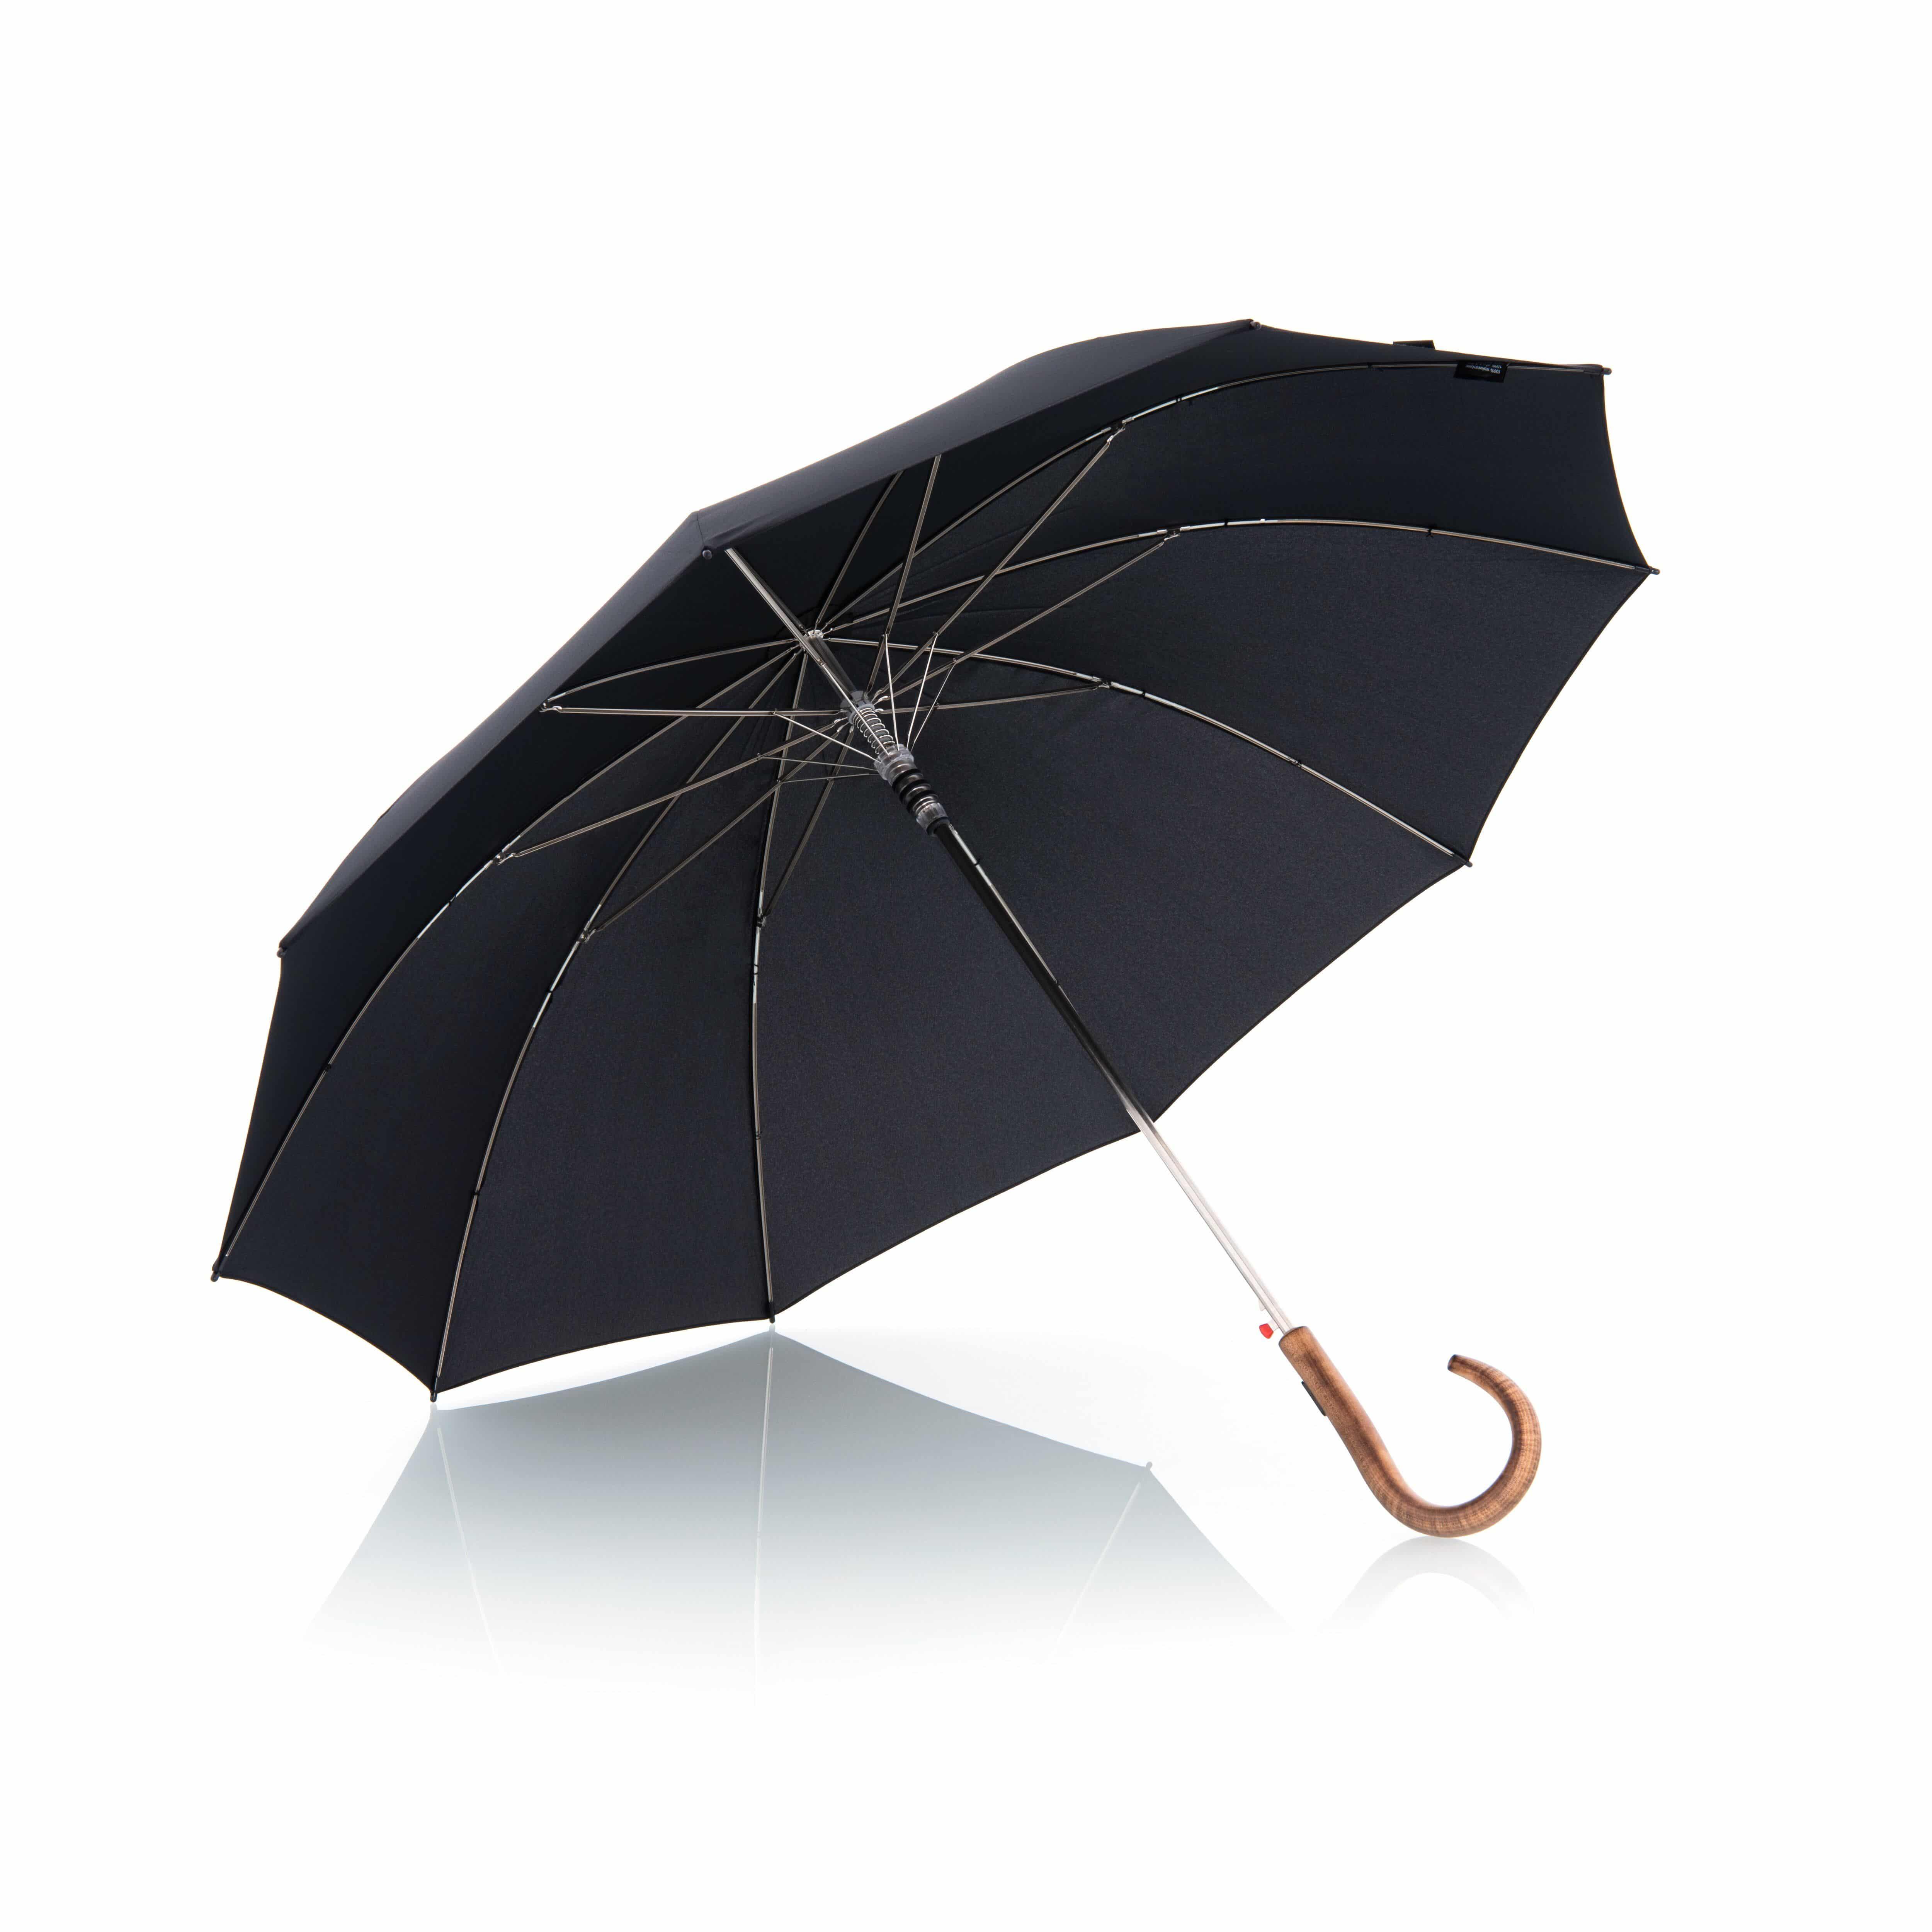 Knirps Umbrella S.770 long automatic - photo 4